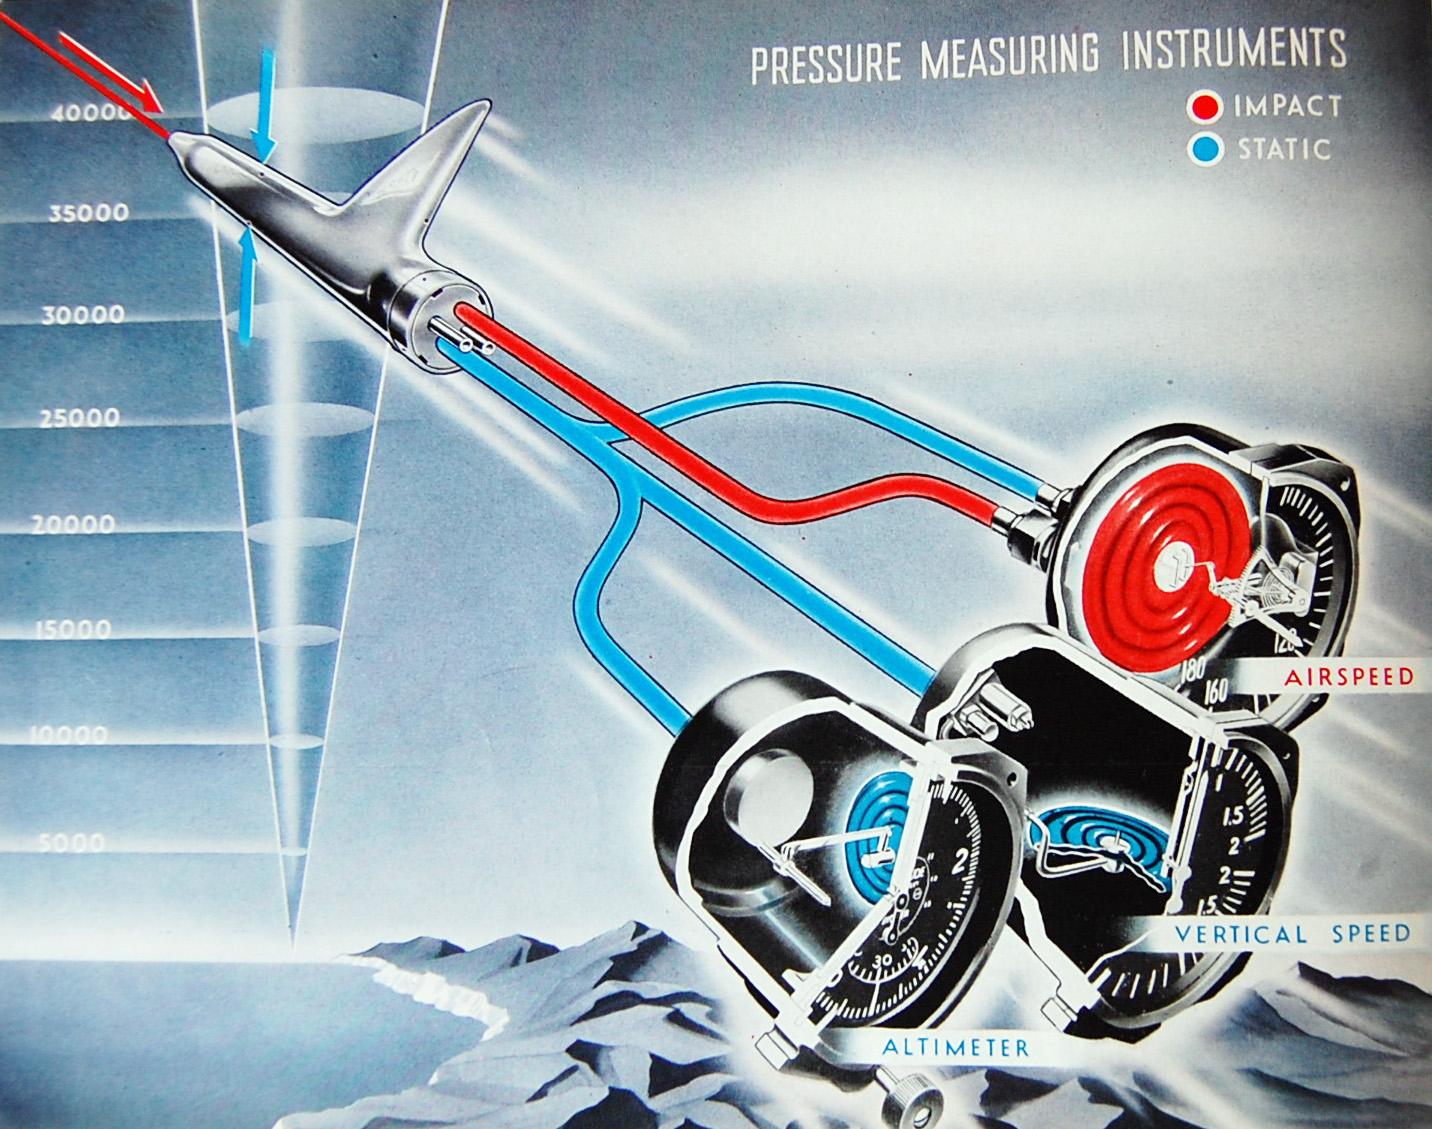 Flight Thru Instruments Manual Pressure Measuring